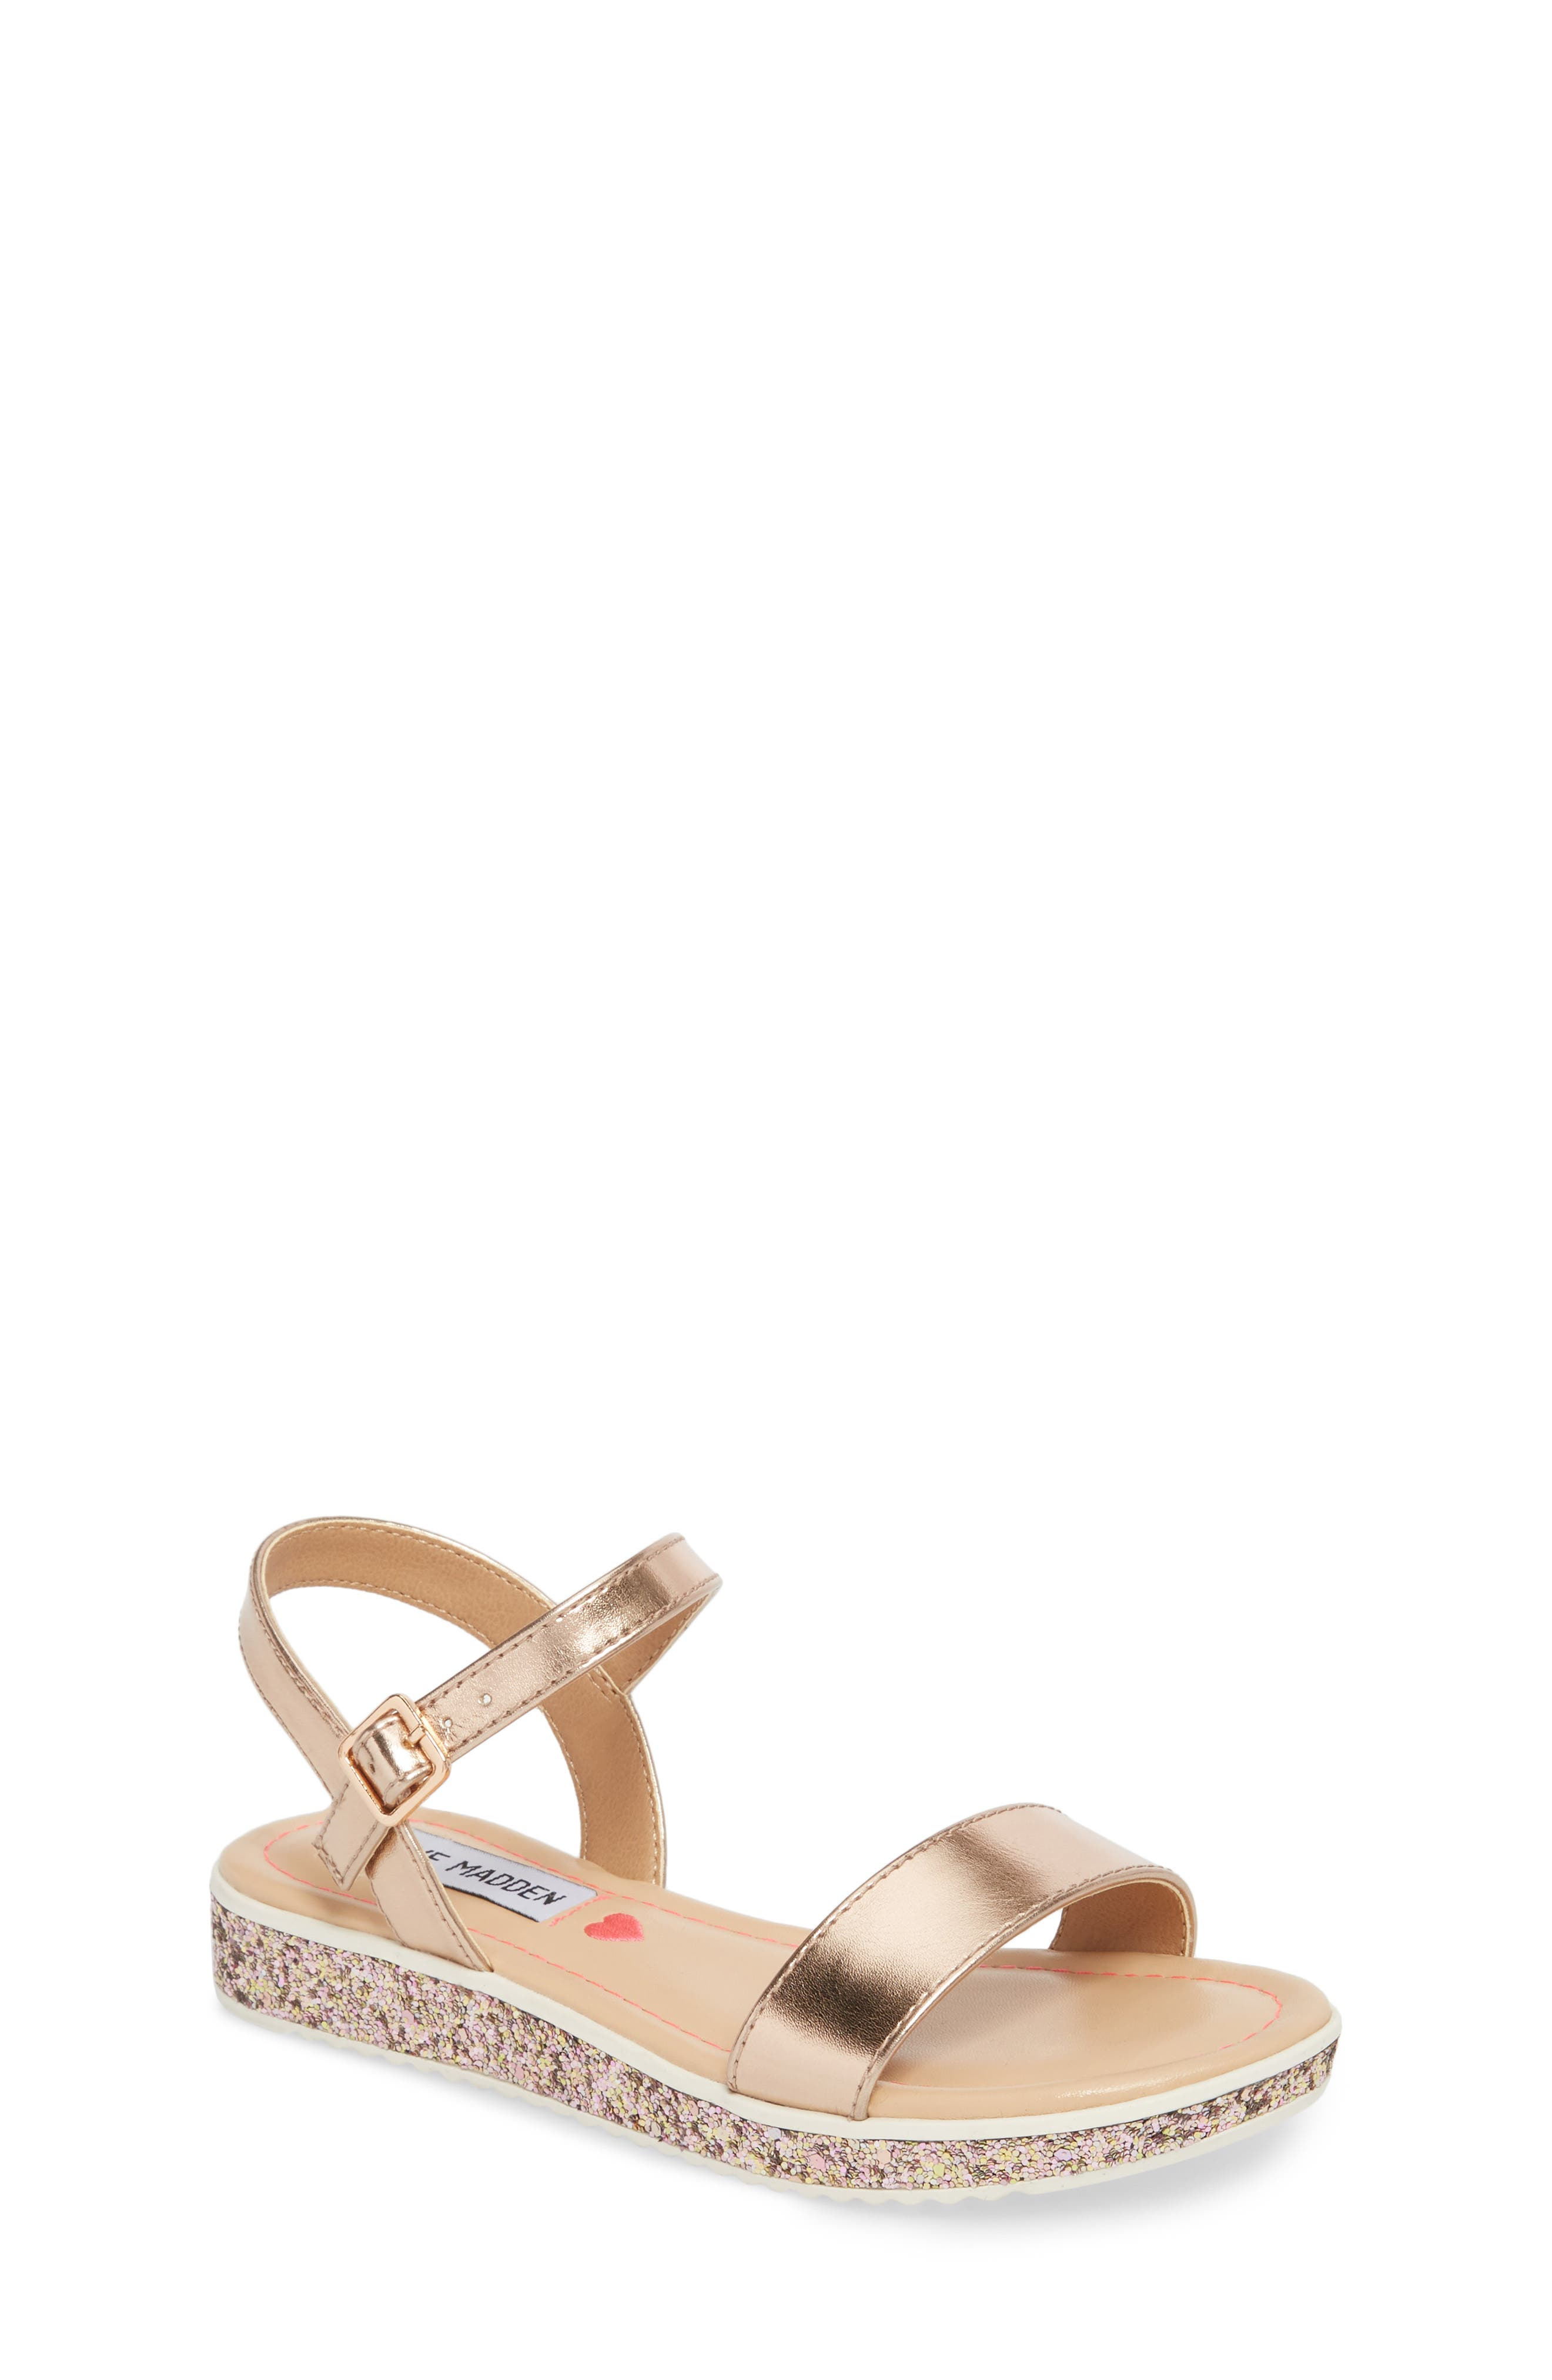 JGLITTER Sandal,                         Main,                         color, ROSE GOLD